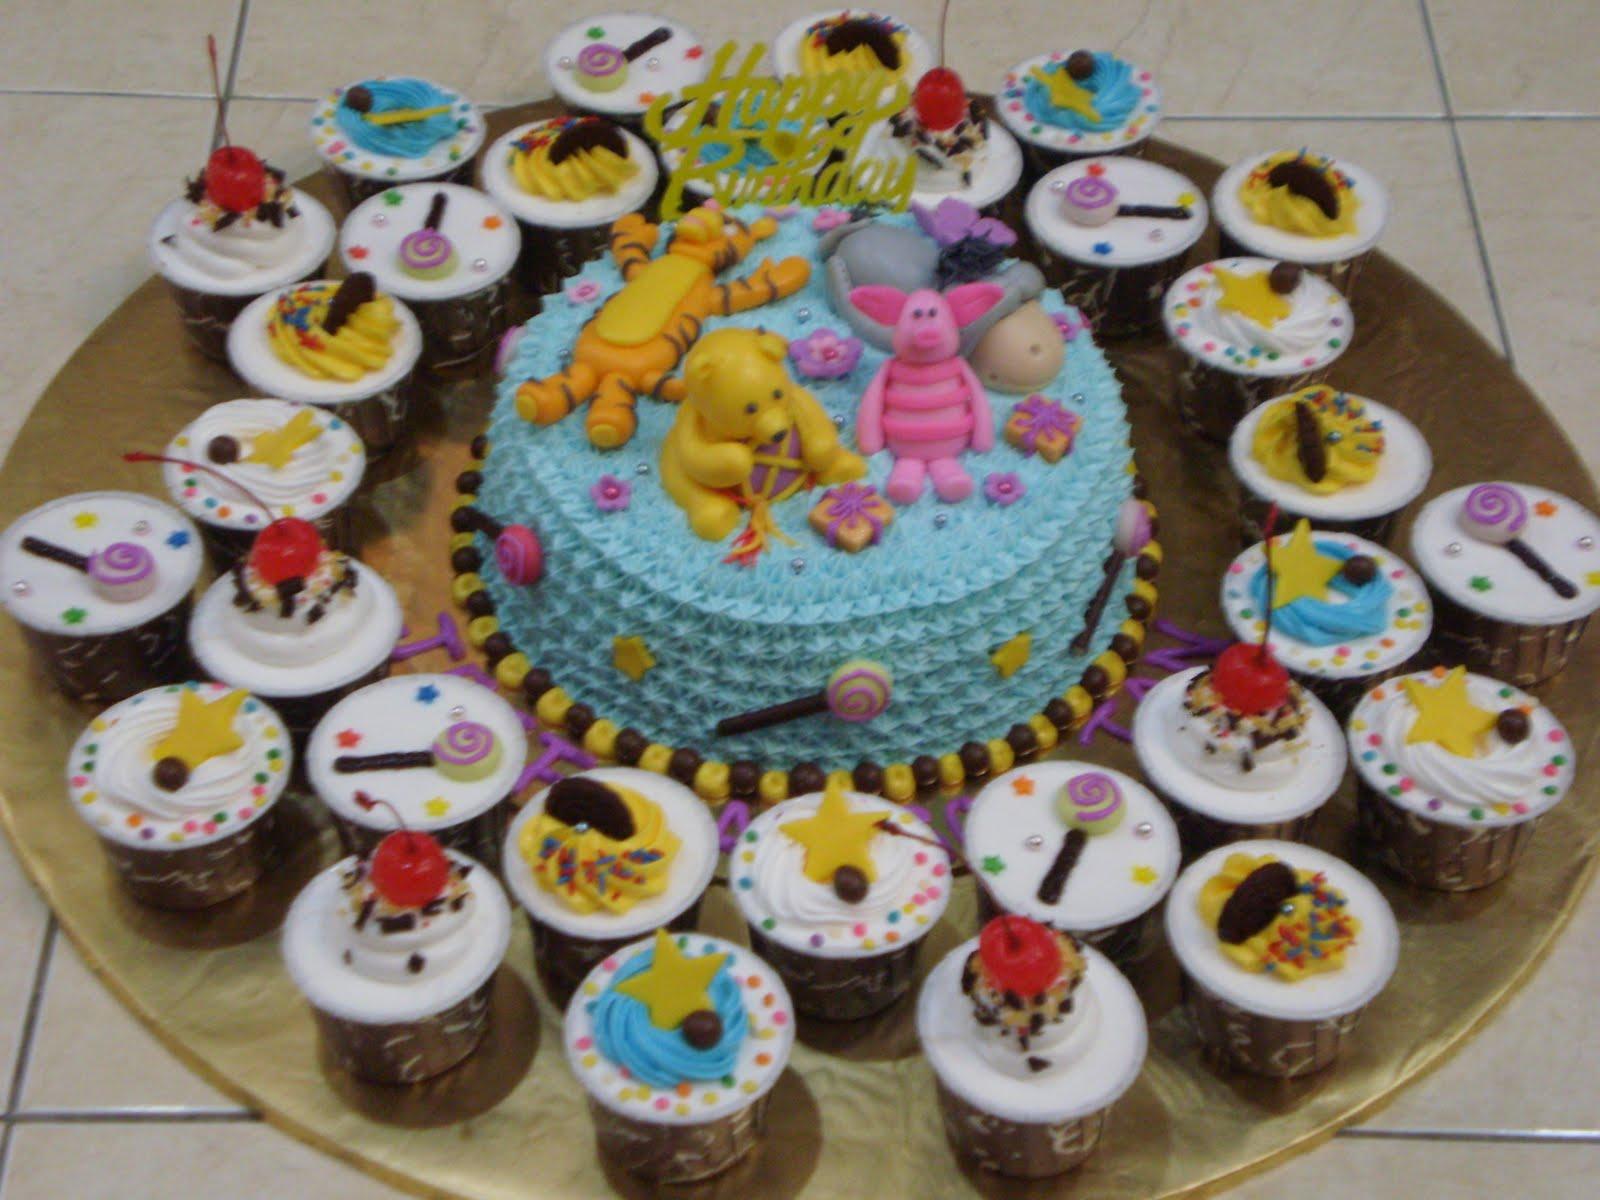 Jeff Jack By Venny Lim Happy Birthday 4th